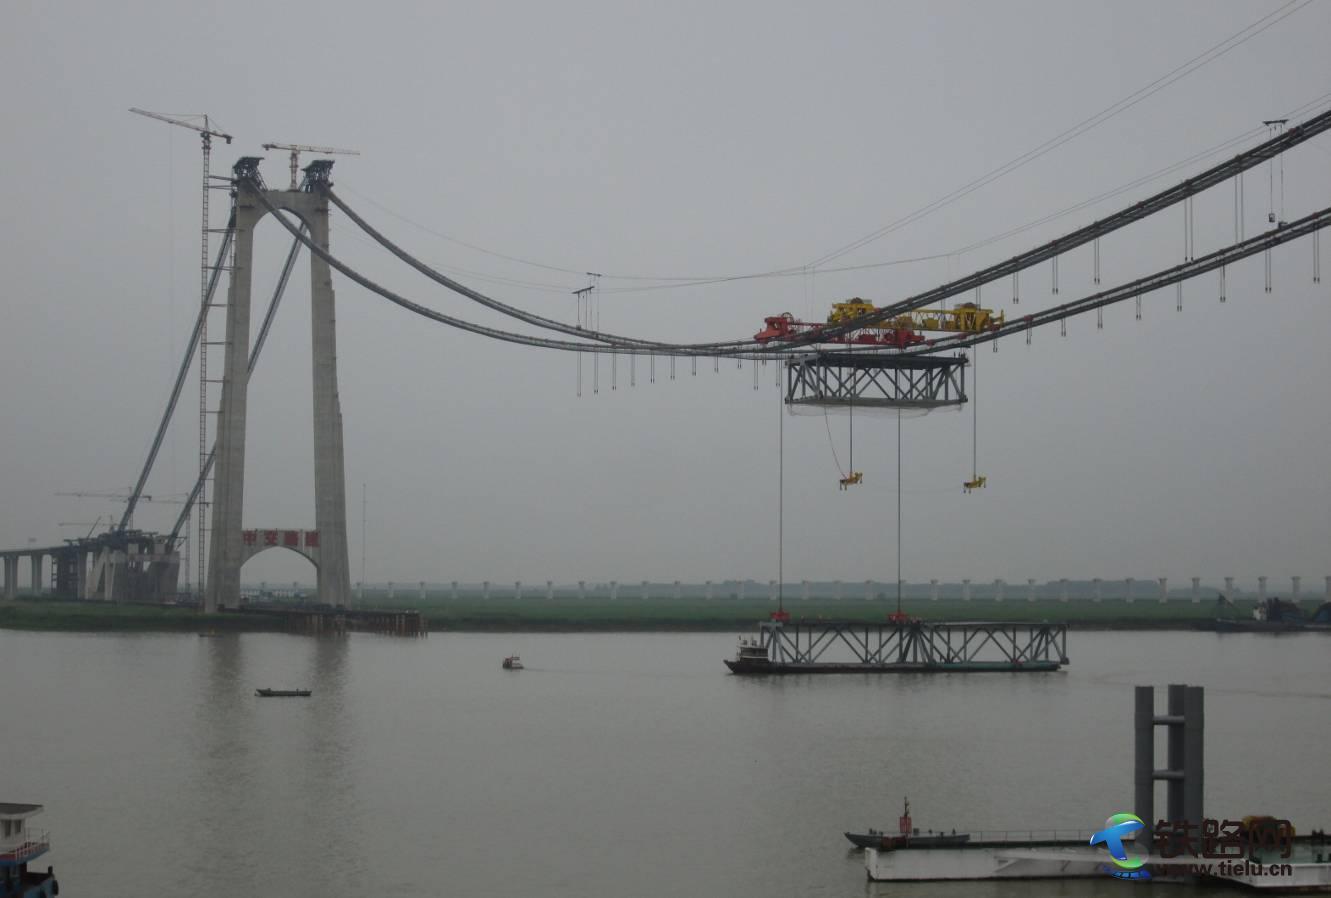 550T缆载吊机应用于湖南洞庭湖大桥钢桁梁的吊装.jpg